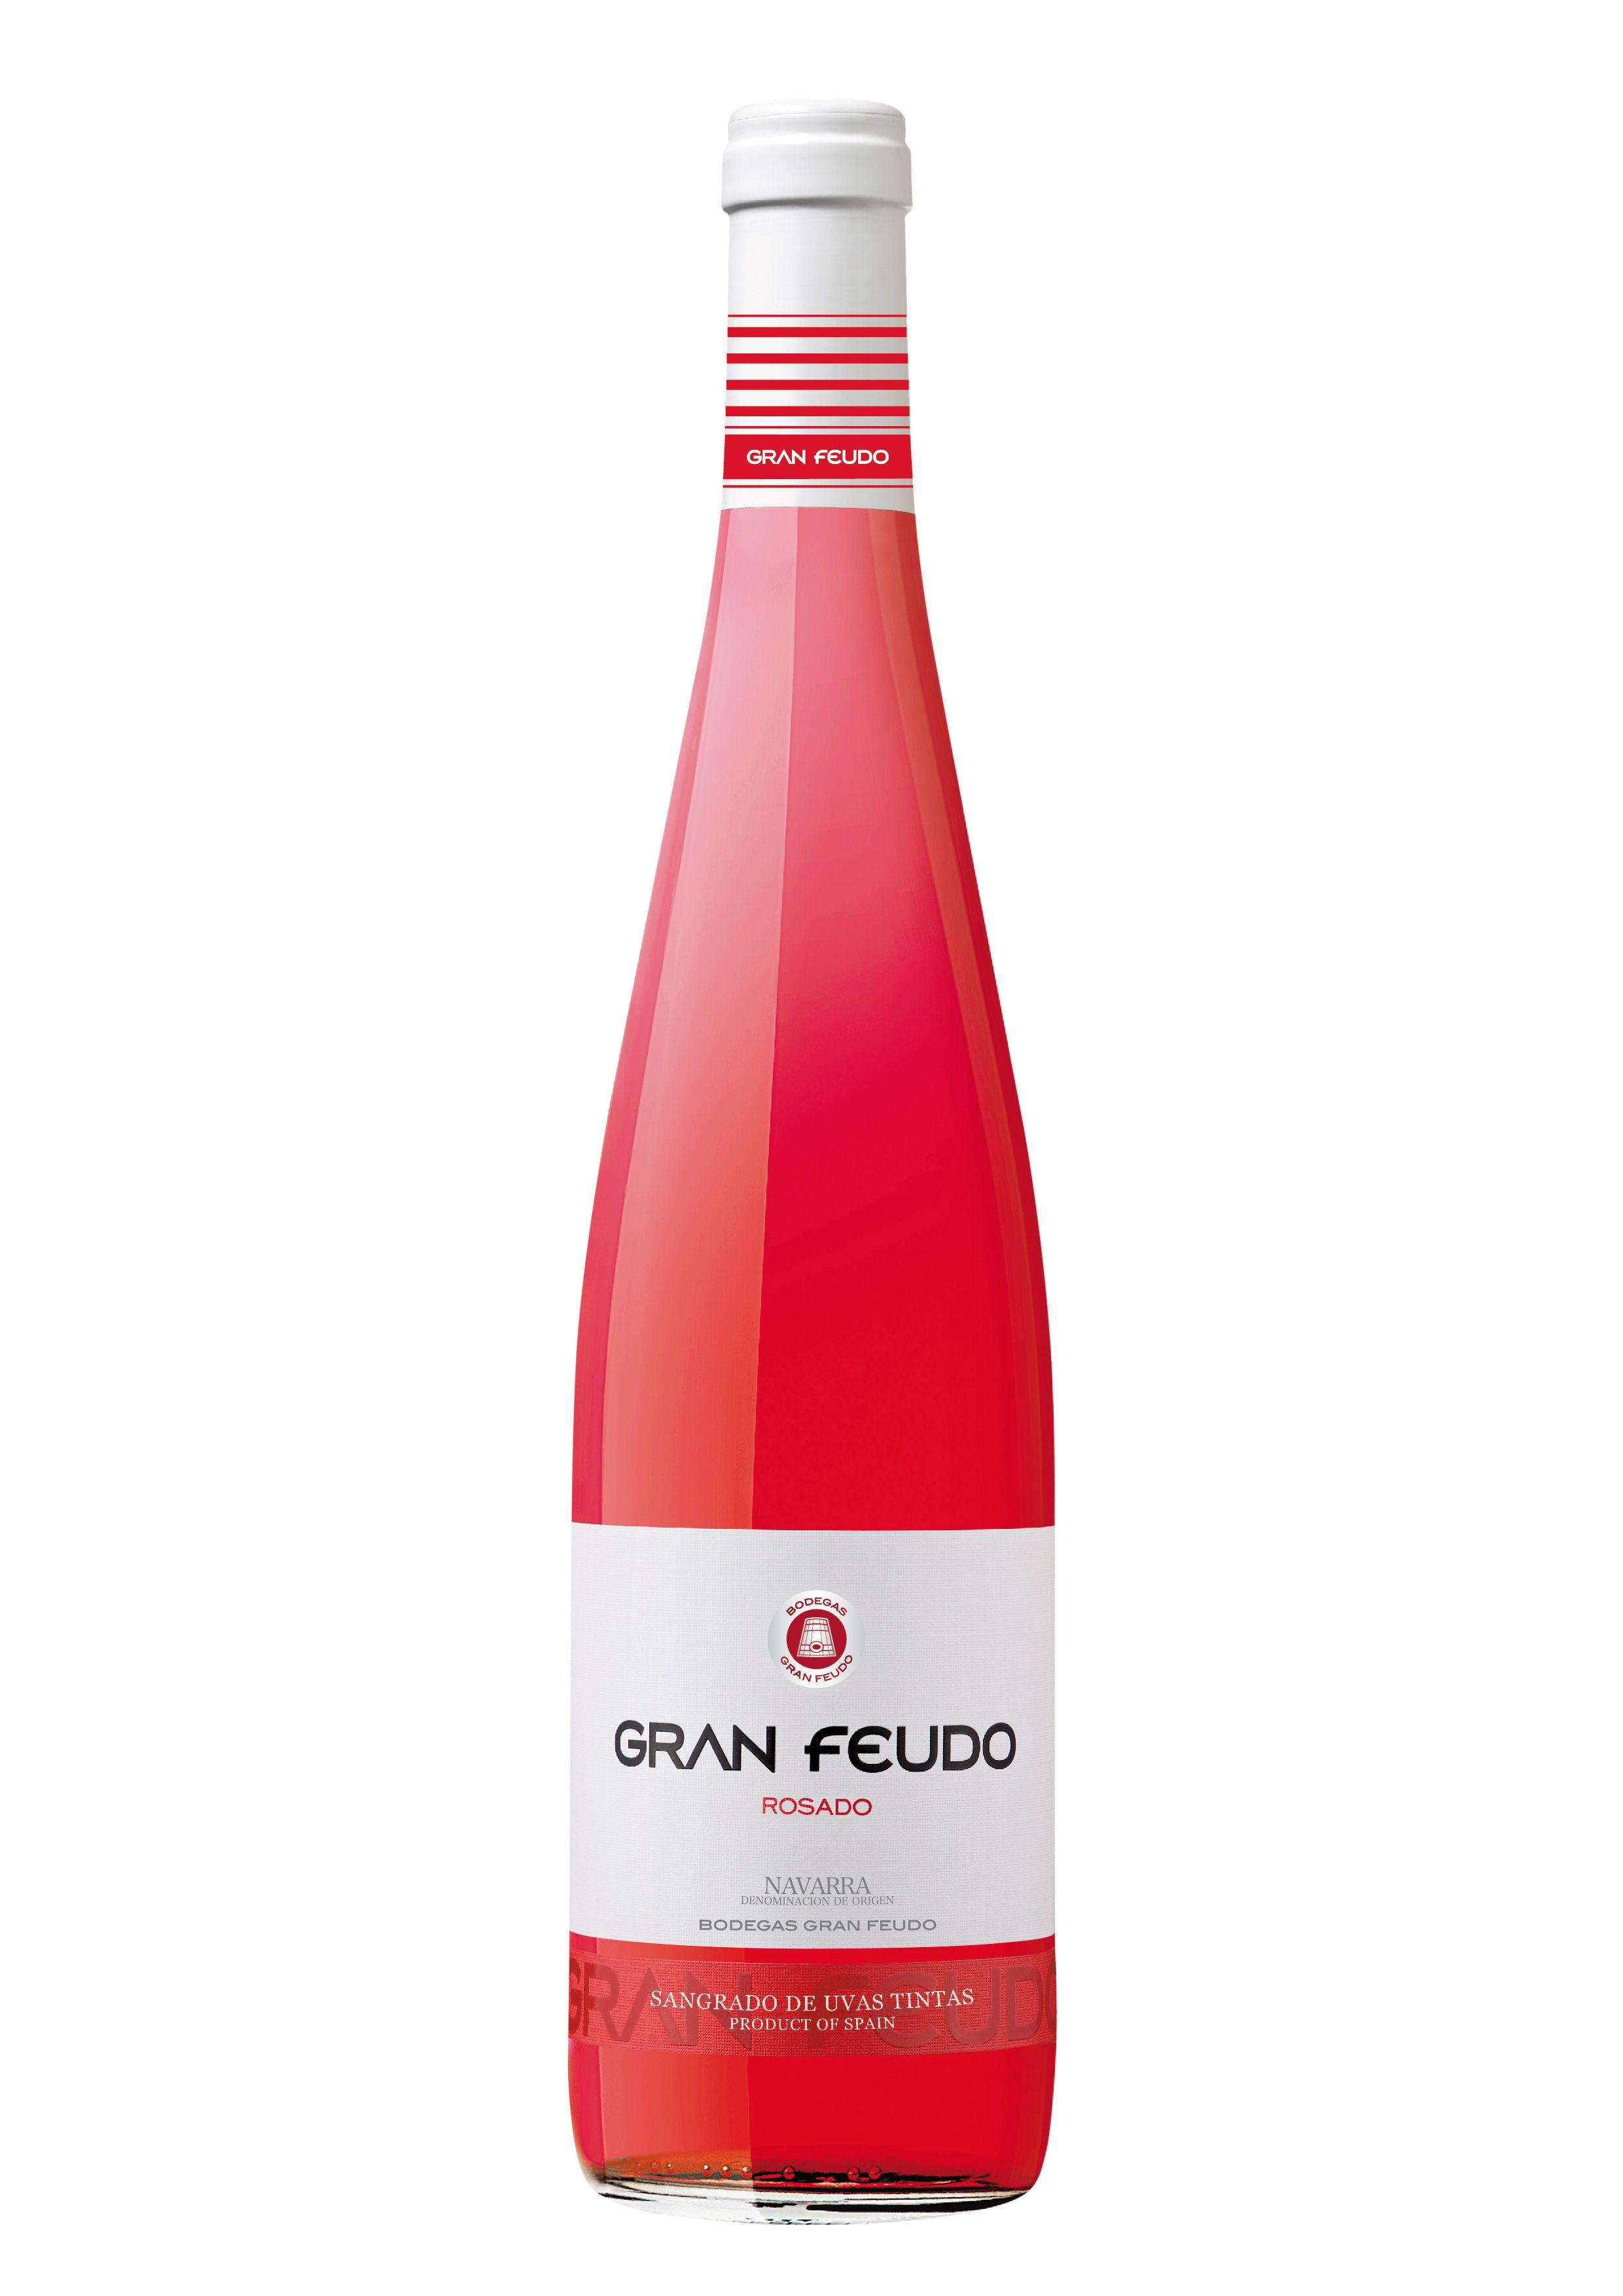 Gran Feudo Rosado Wine Taninotanino Vinosmaximum Bottle Label Design Wine And Spirits Spanish Wine